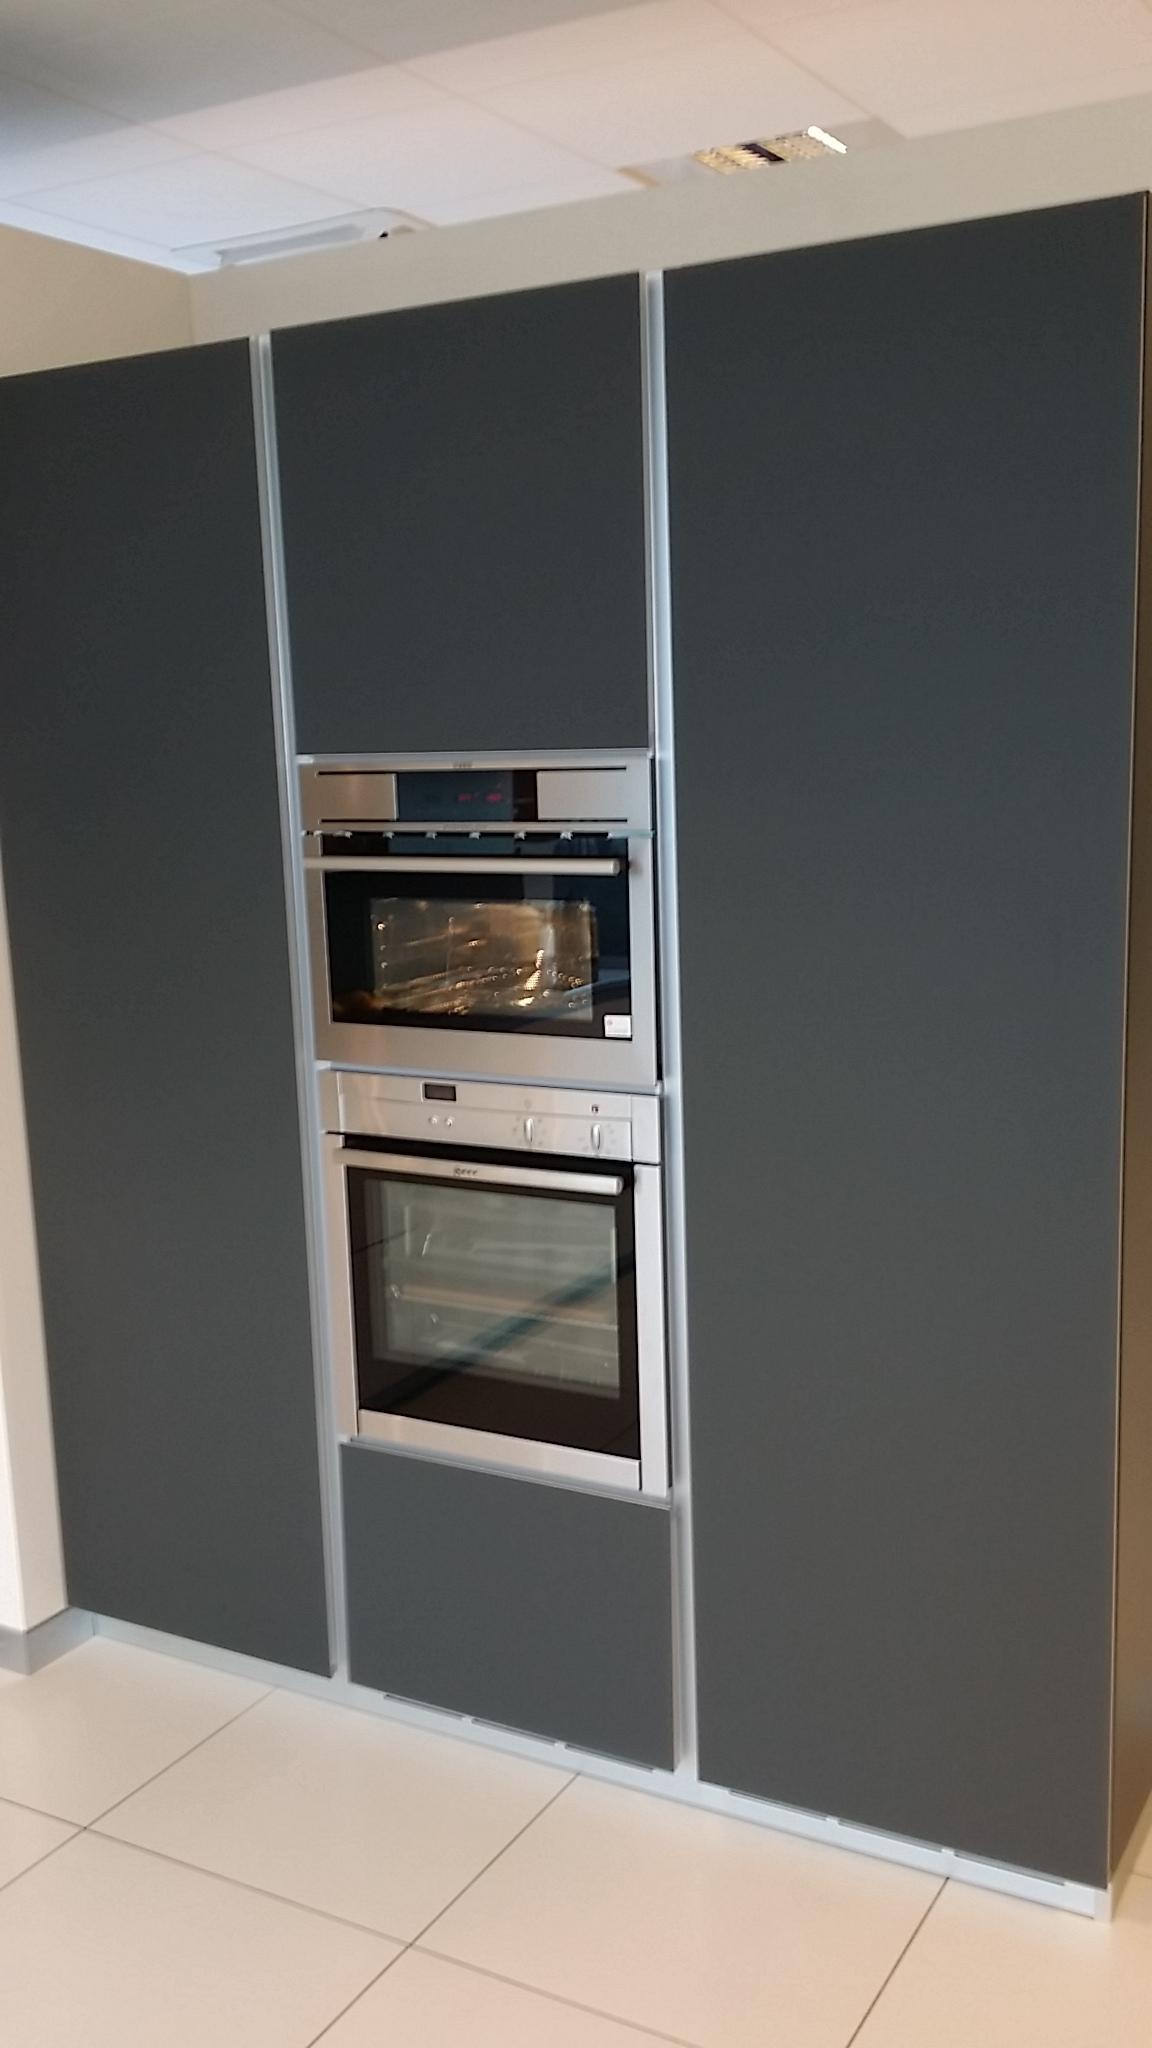 Outlet Cucina Mesons K_GOCCIA VETRO - Cucine a prezzi scontati